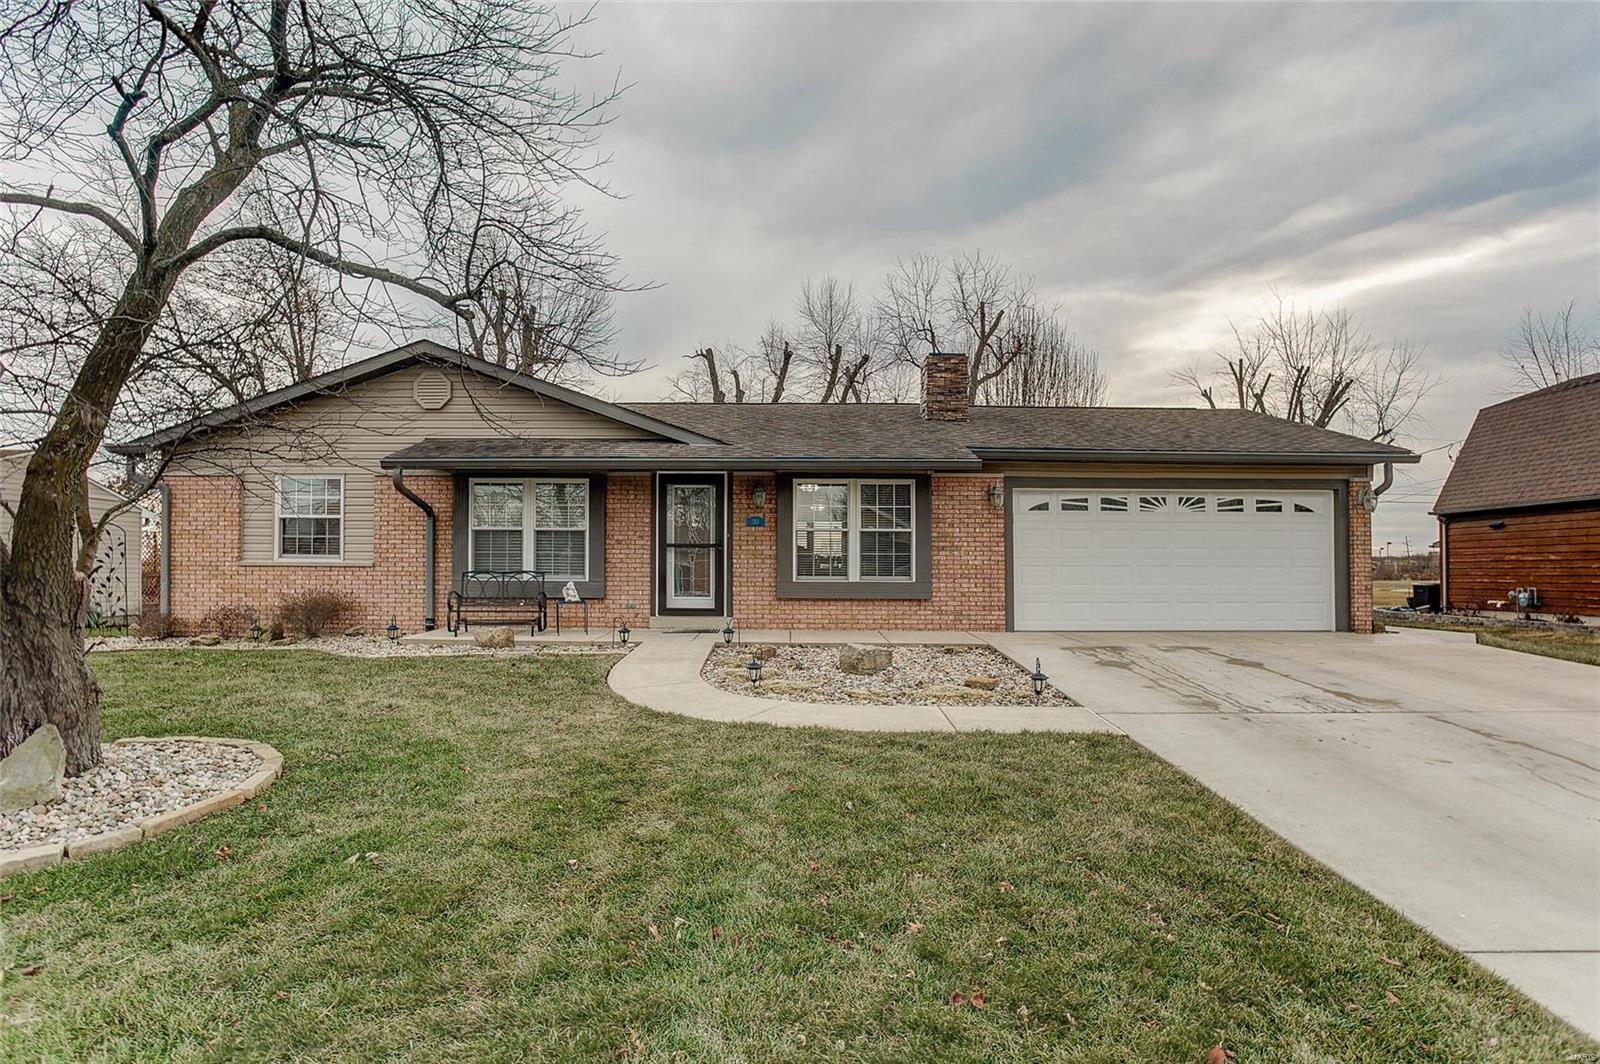 218 E Shiloh Drive Property Photo - Red Bud, IL real estate listing